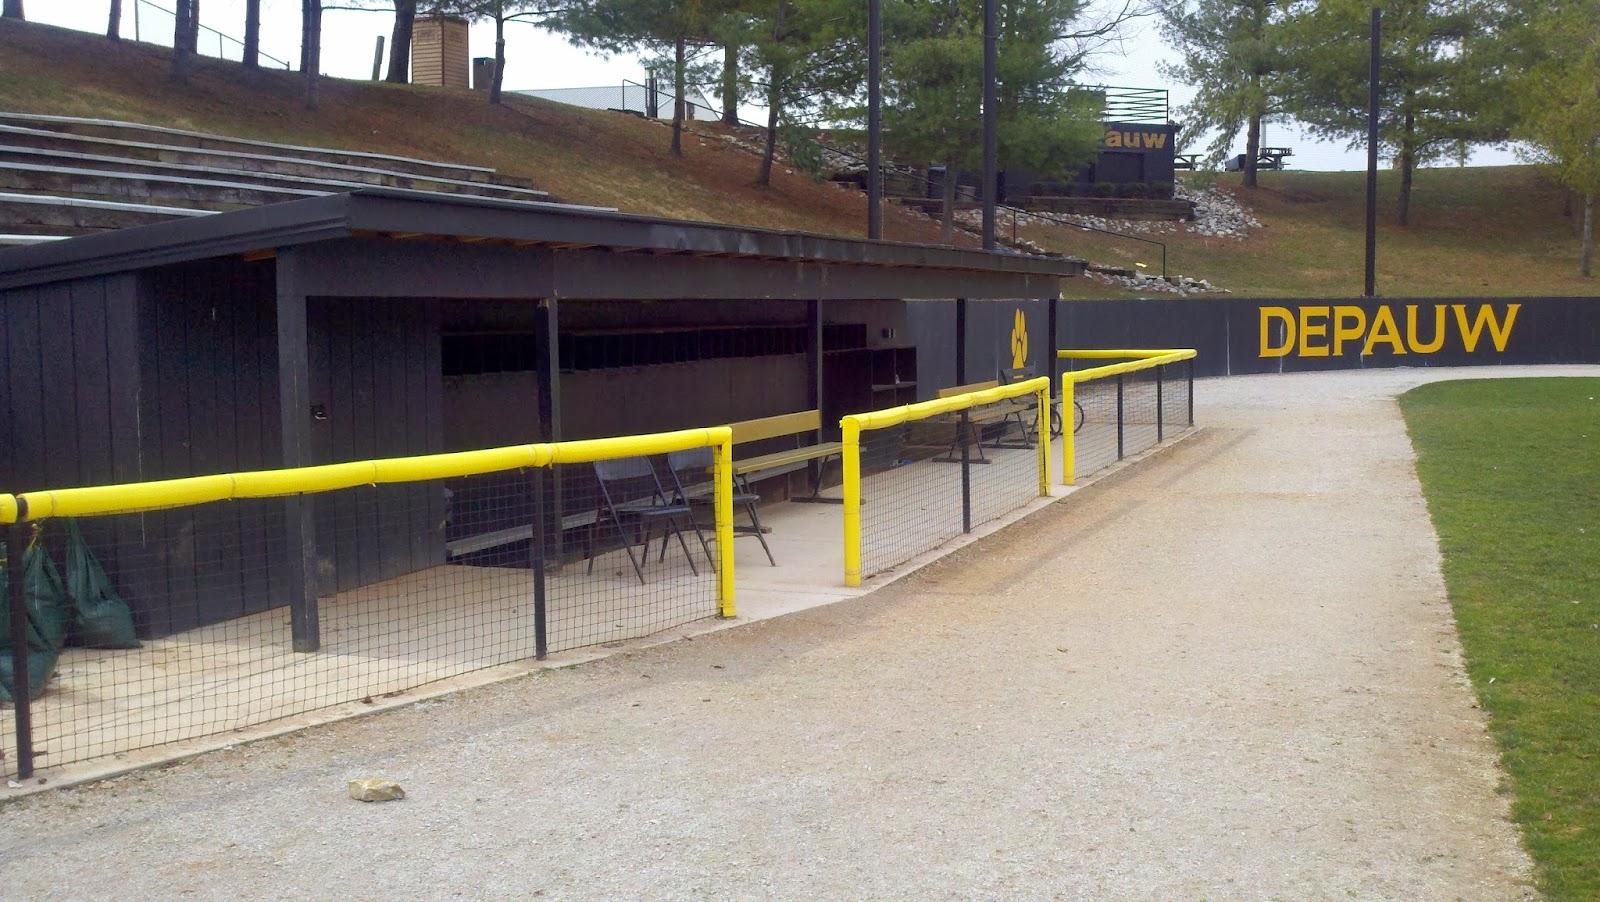 Baseball Dugout Bedroom Designs: Smart Turf: Baseball Field Dugout Design And Layout Vol 2